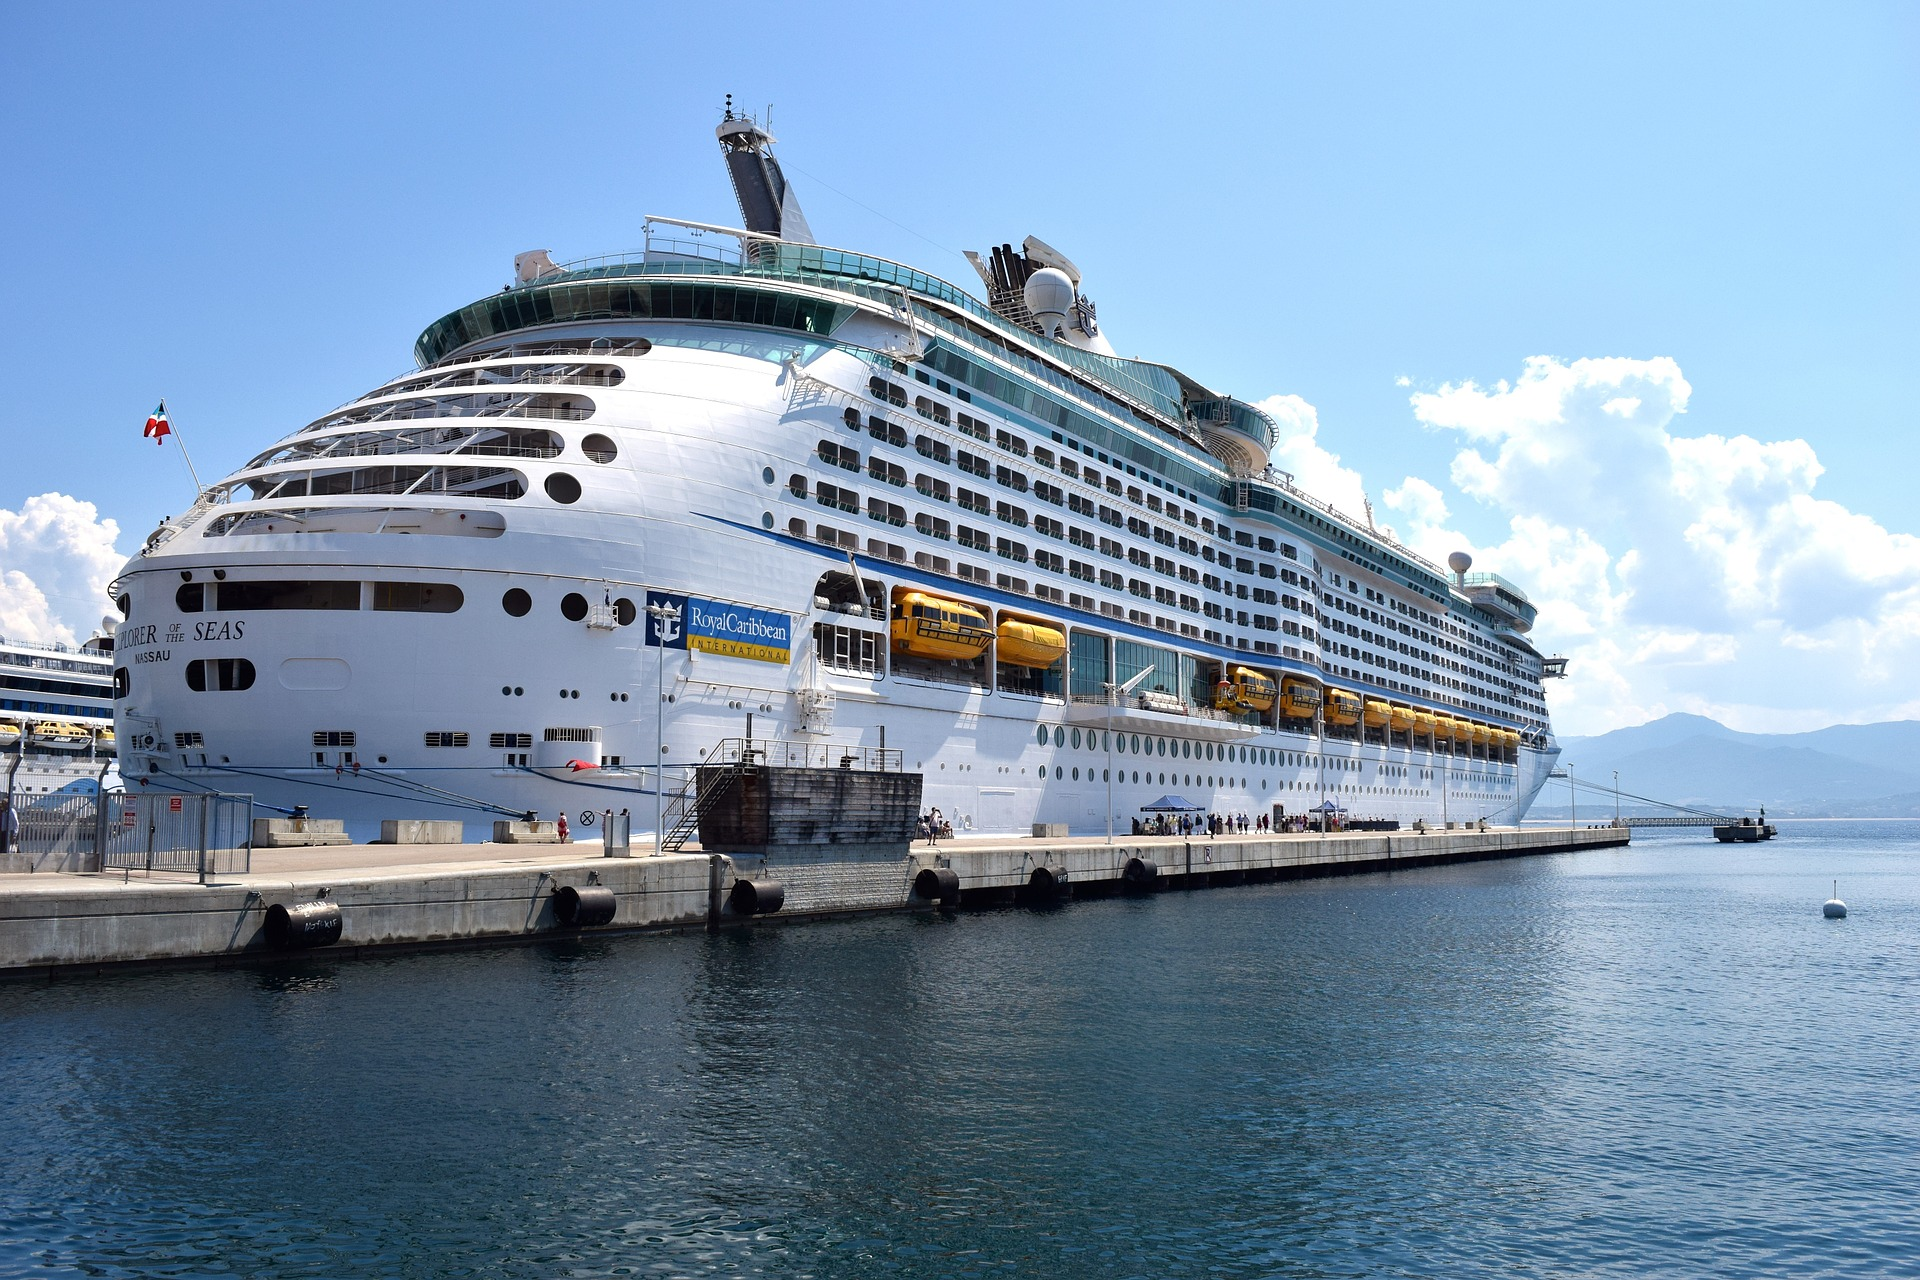 Cruise on the port photo